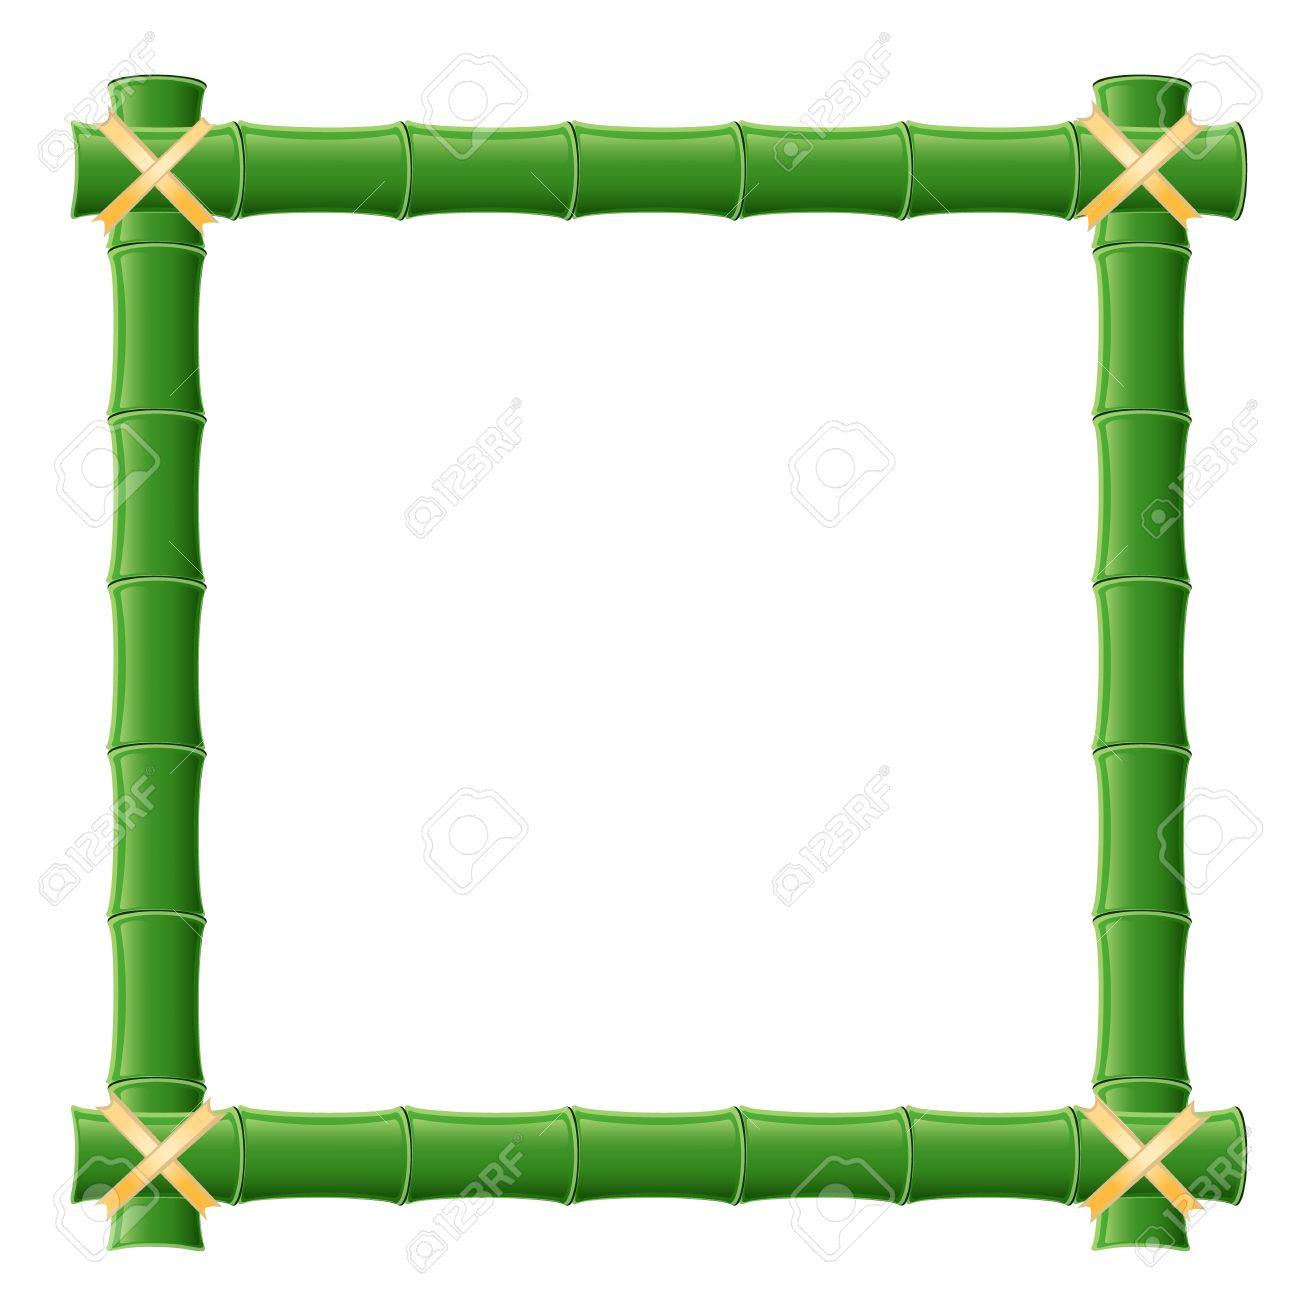 bamboo frame royalty free cliparts vectors and stock illustration rh 123rf com clipart bamboo border vector